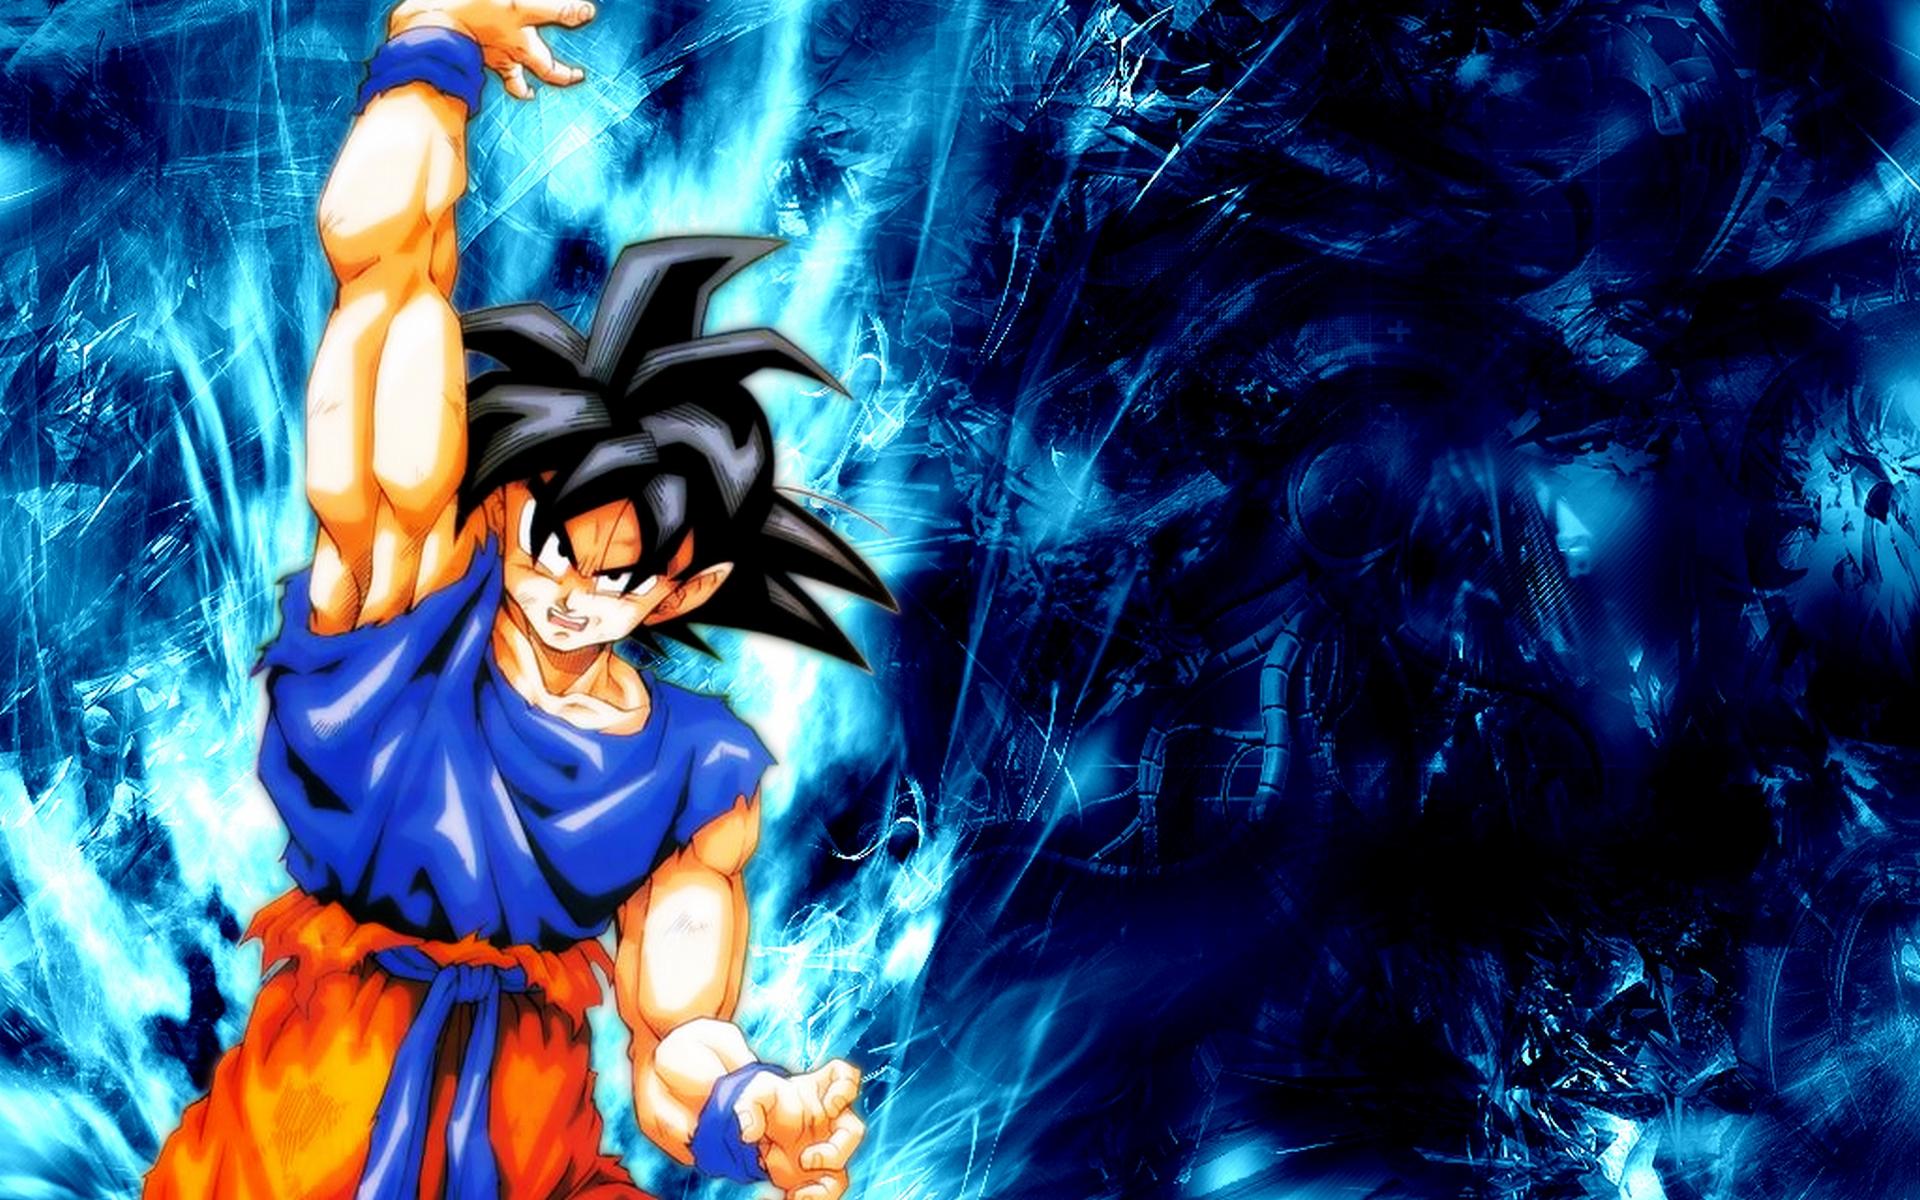 Son Goku Dragon Ball Z Wallpaper 2986 Wallpaper WallpaperLepi 1920x1200